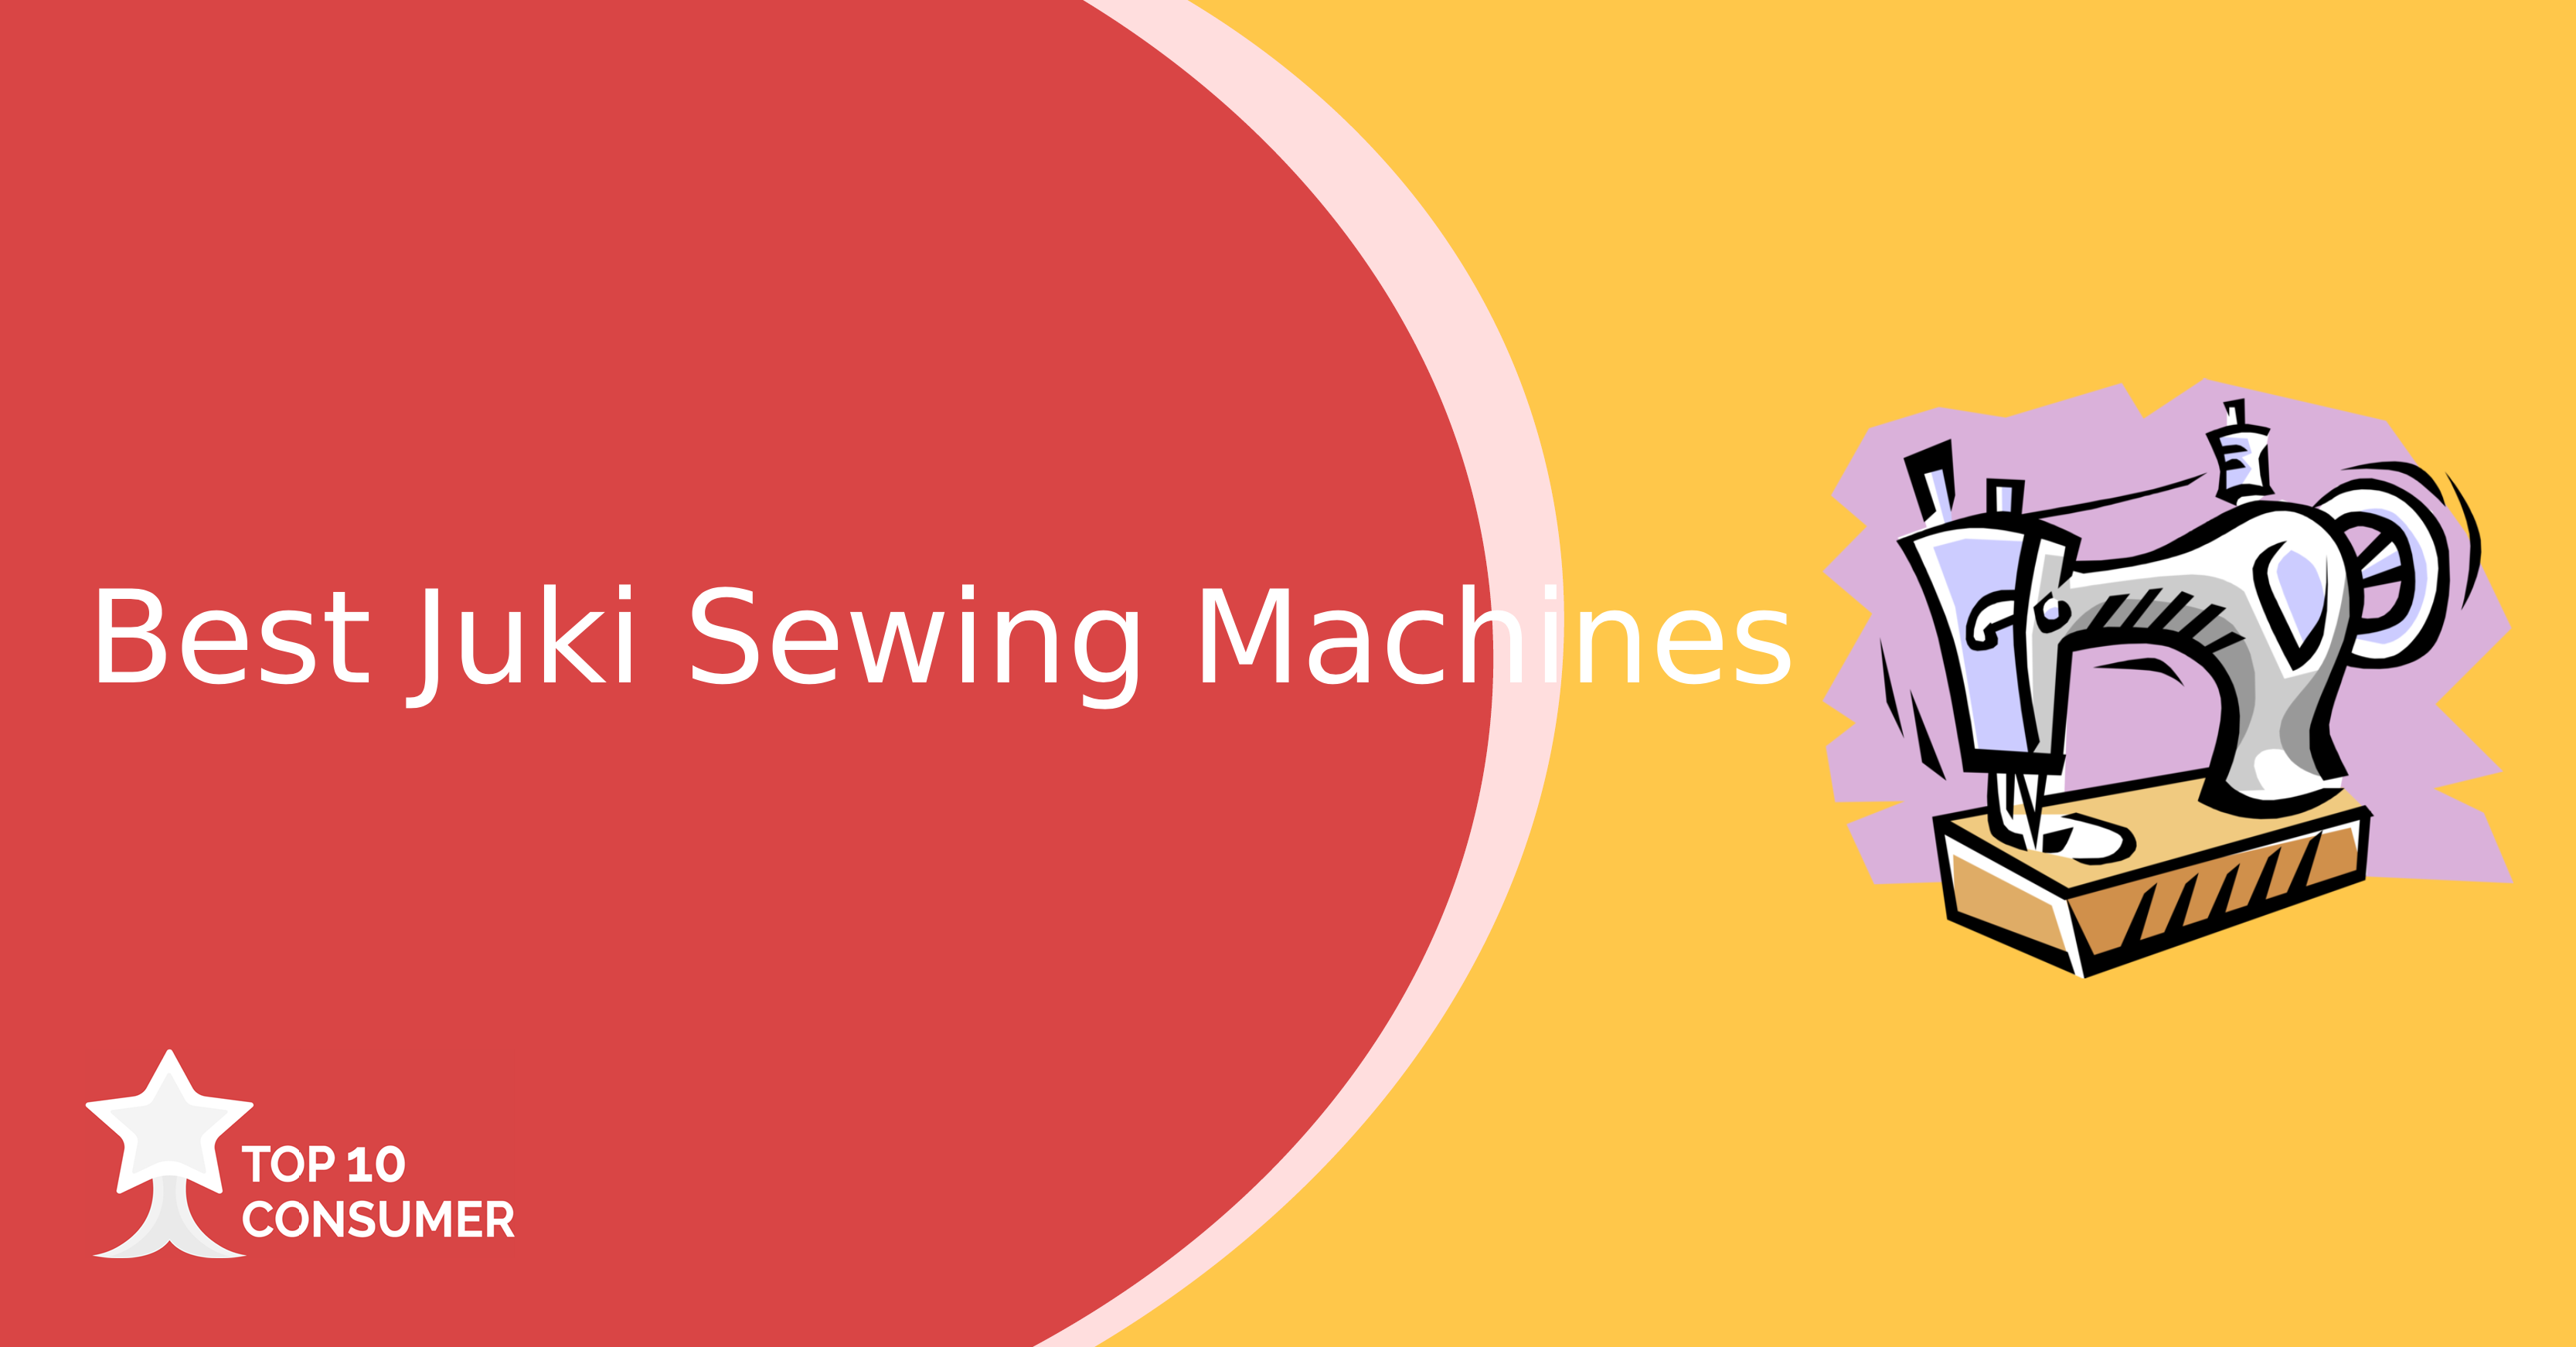 Best Juki Sewing Machines